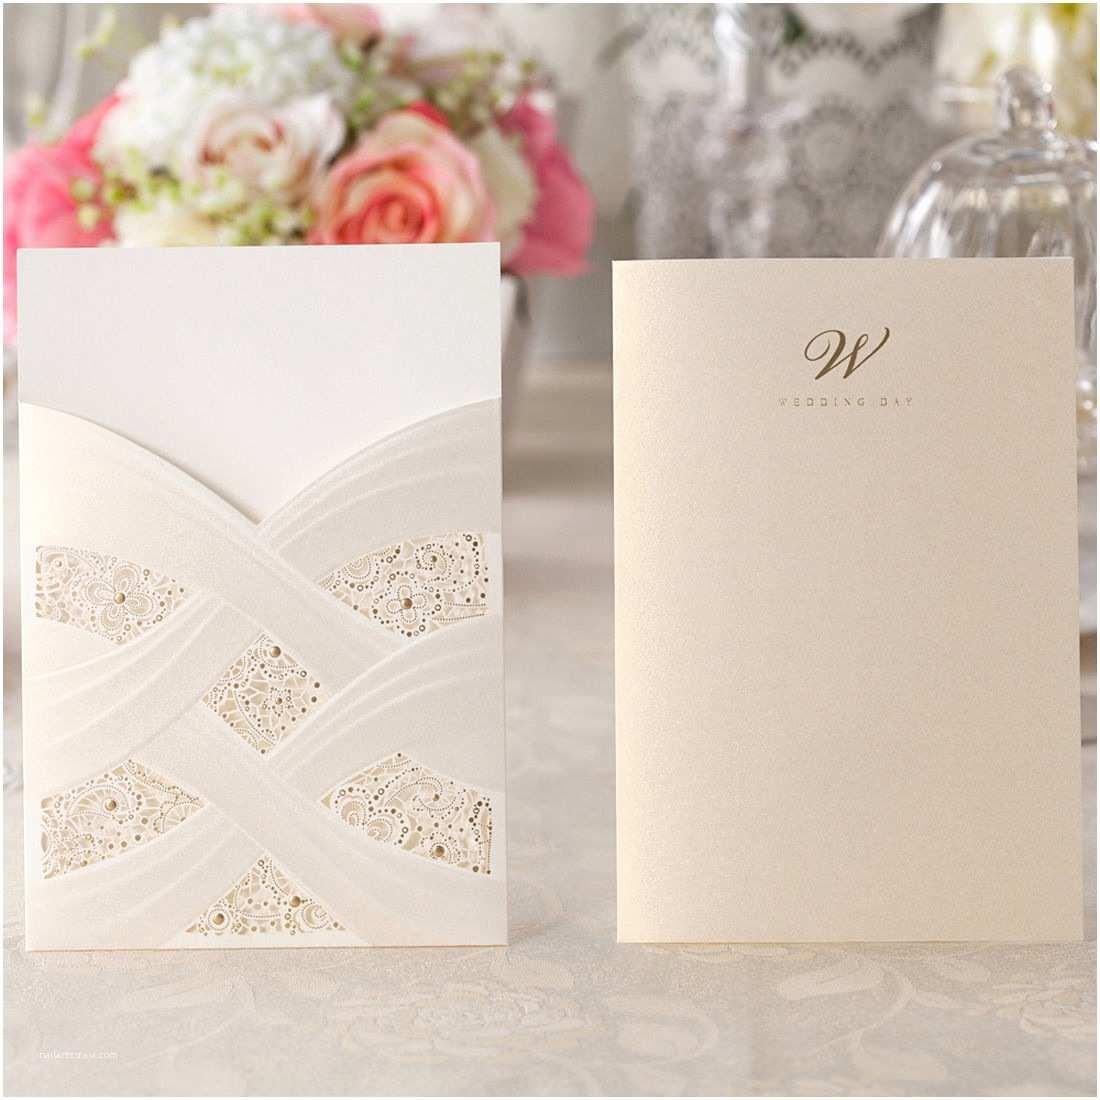 Personal Wedding Invitation Pocket Wedding Invitation Card Kit Cw060 with Envelope